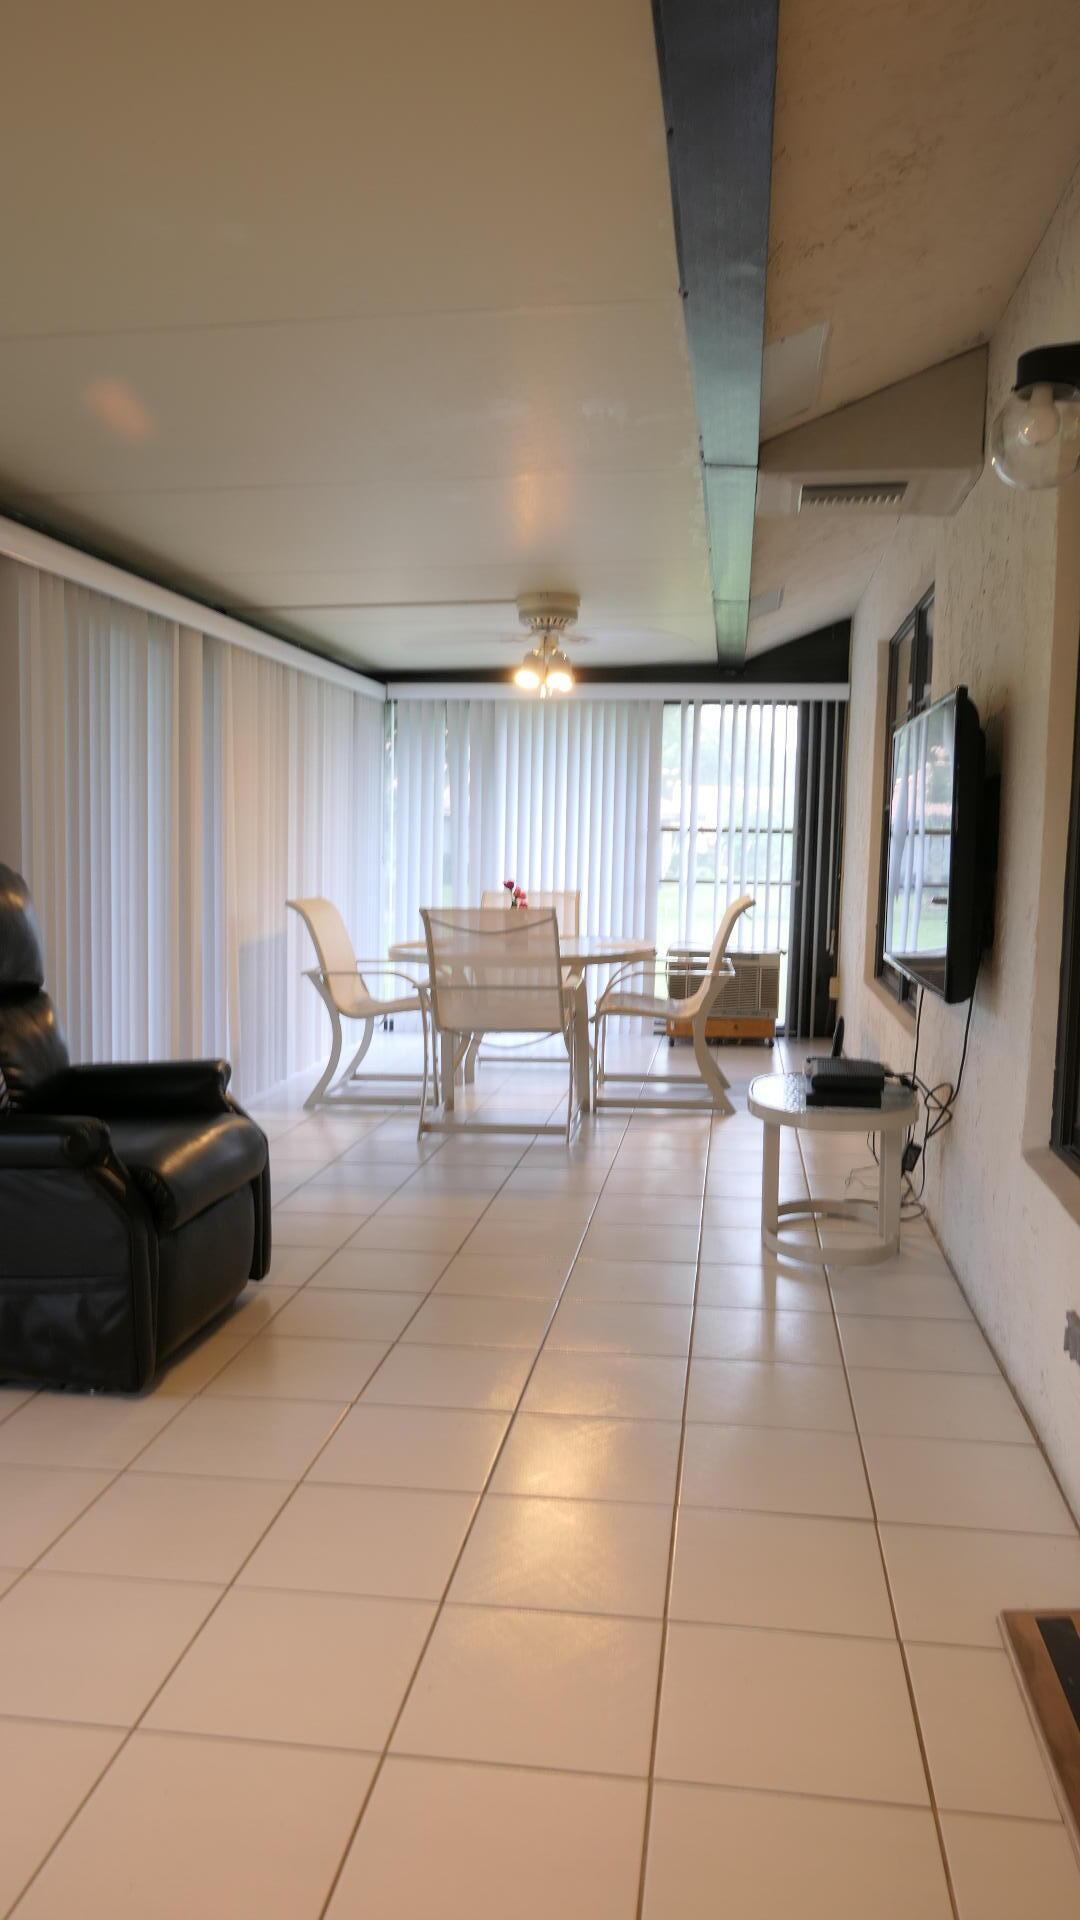 10977 Washingtonia Palm Court B Boynton Beach, FL 33437 photo 48